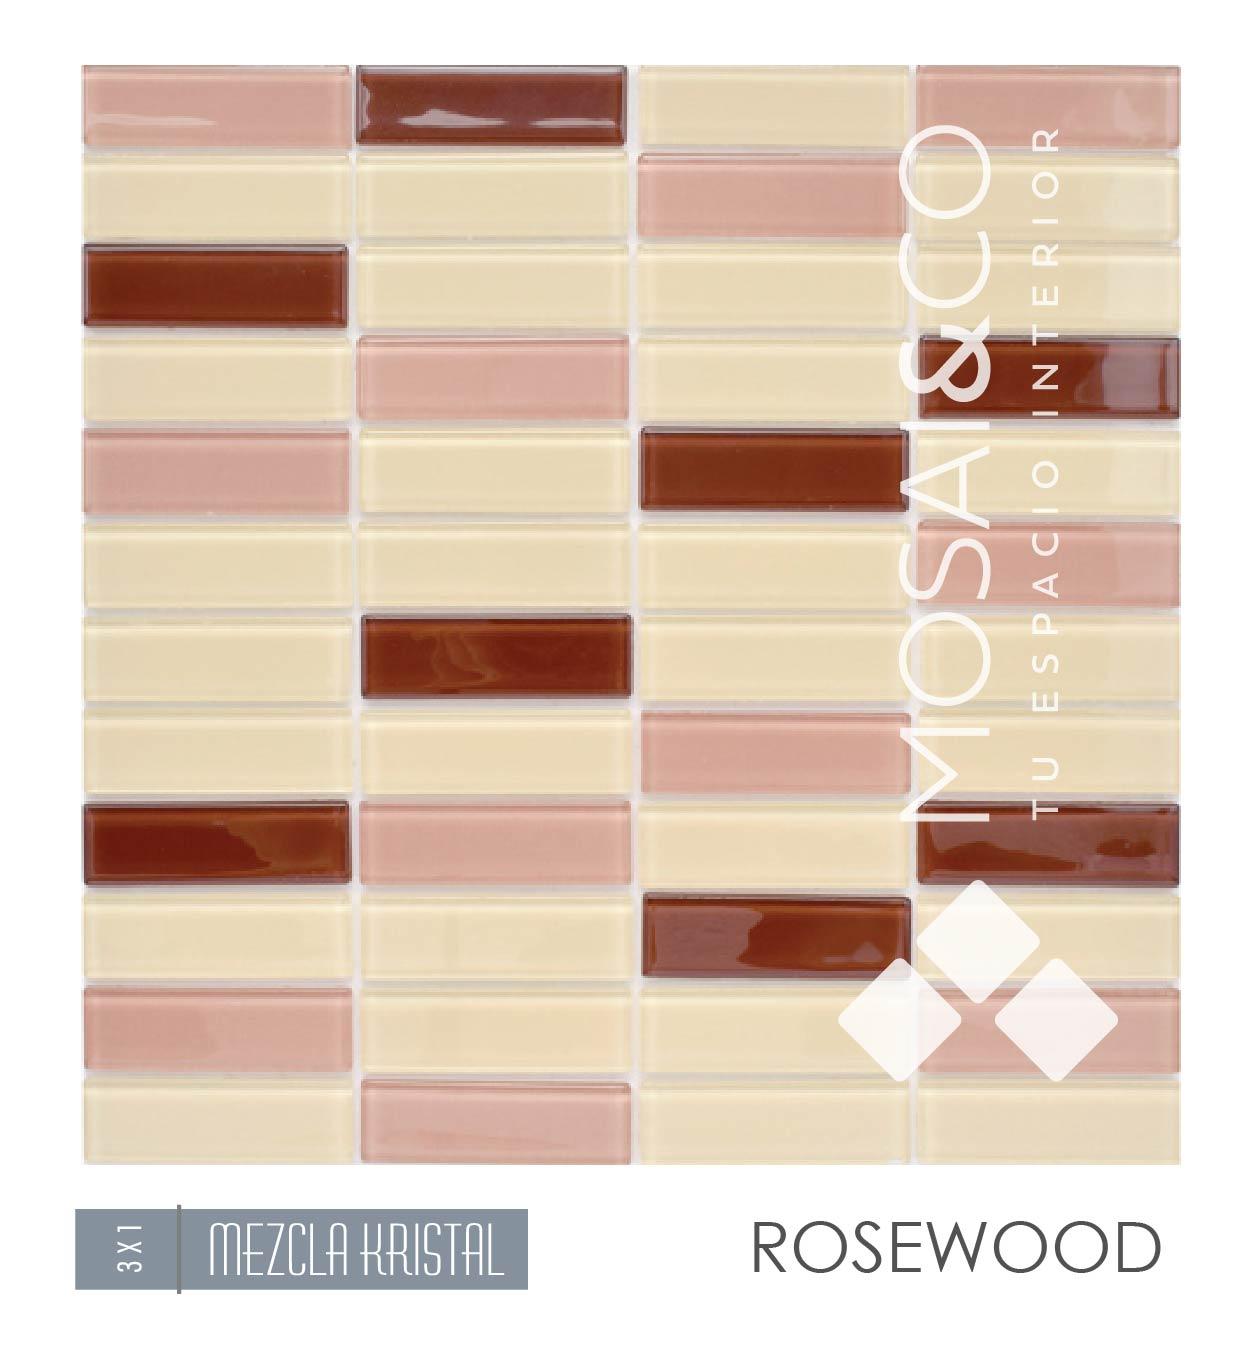 mosaico-linea-mezcla-kristal-mosaiandco-3X1-rosewood